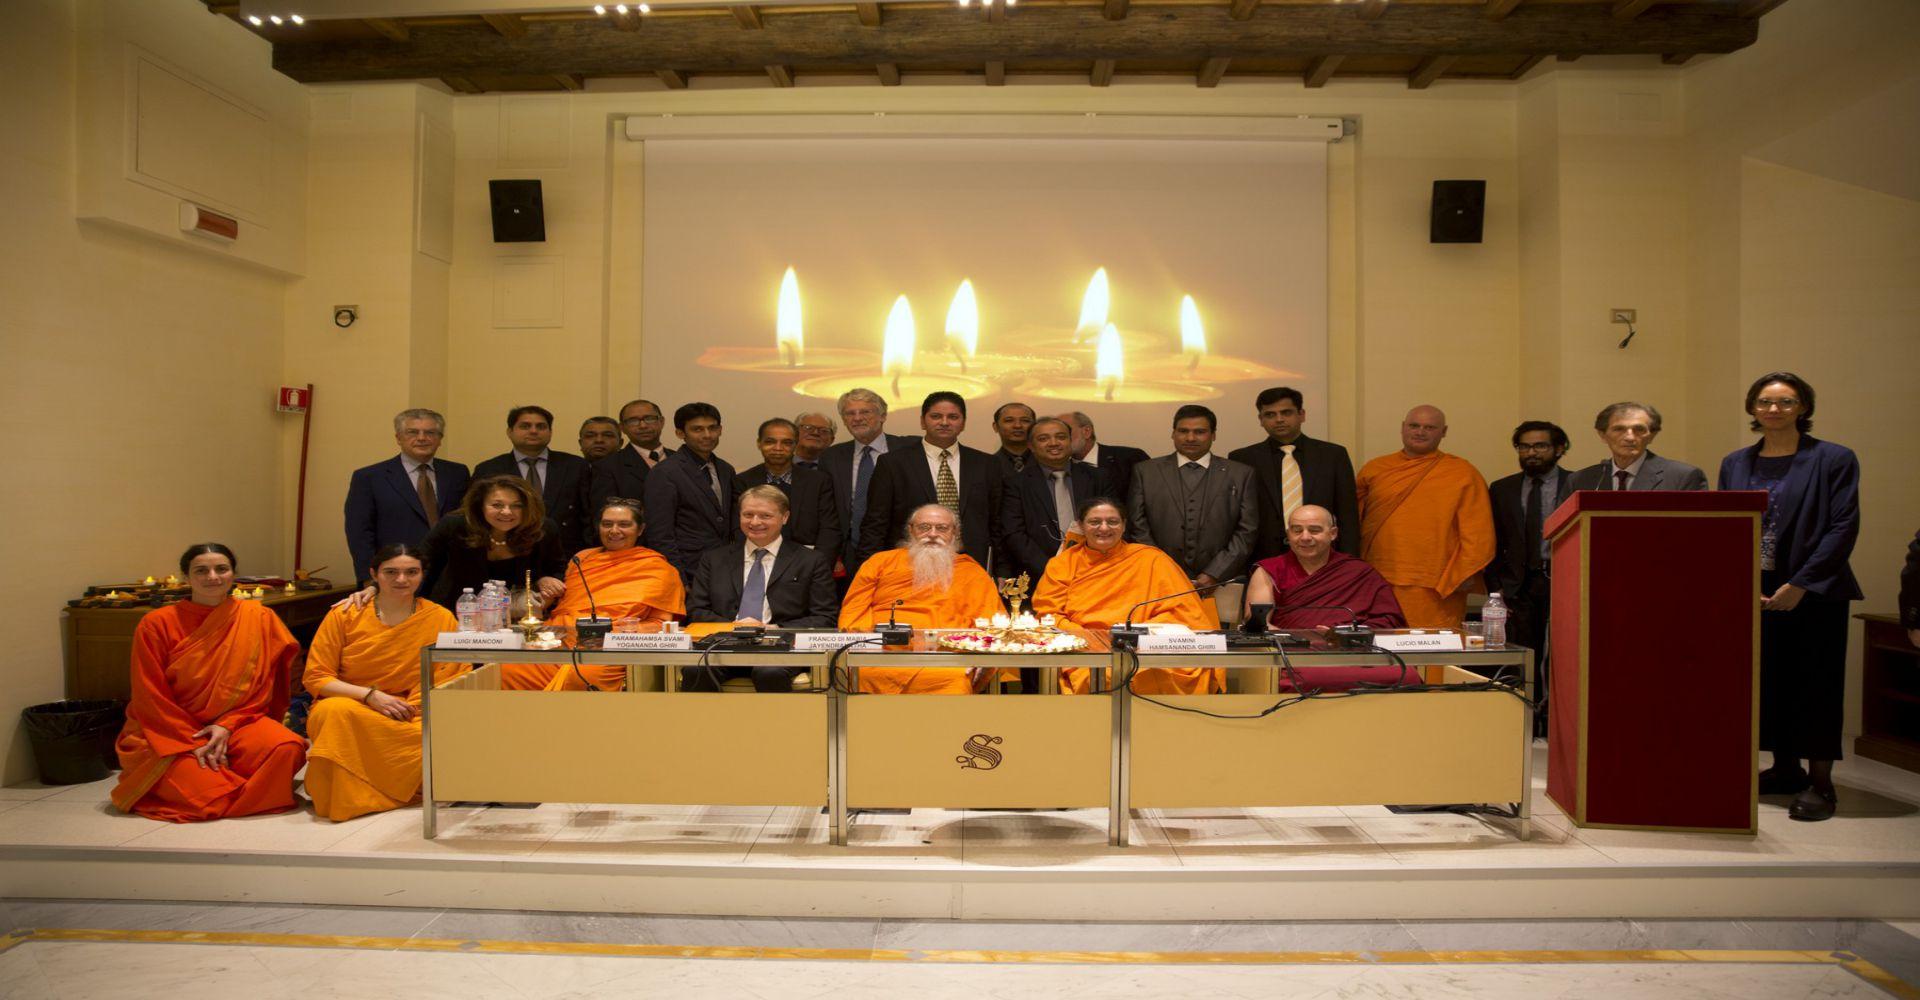 Dipavali all'Ambasciata dell'India a Roma